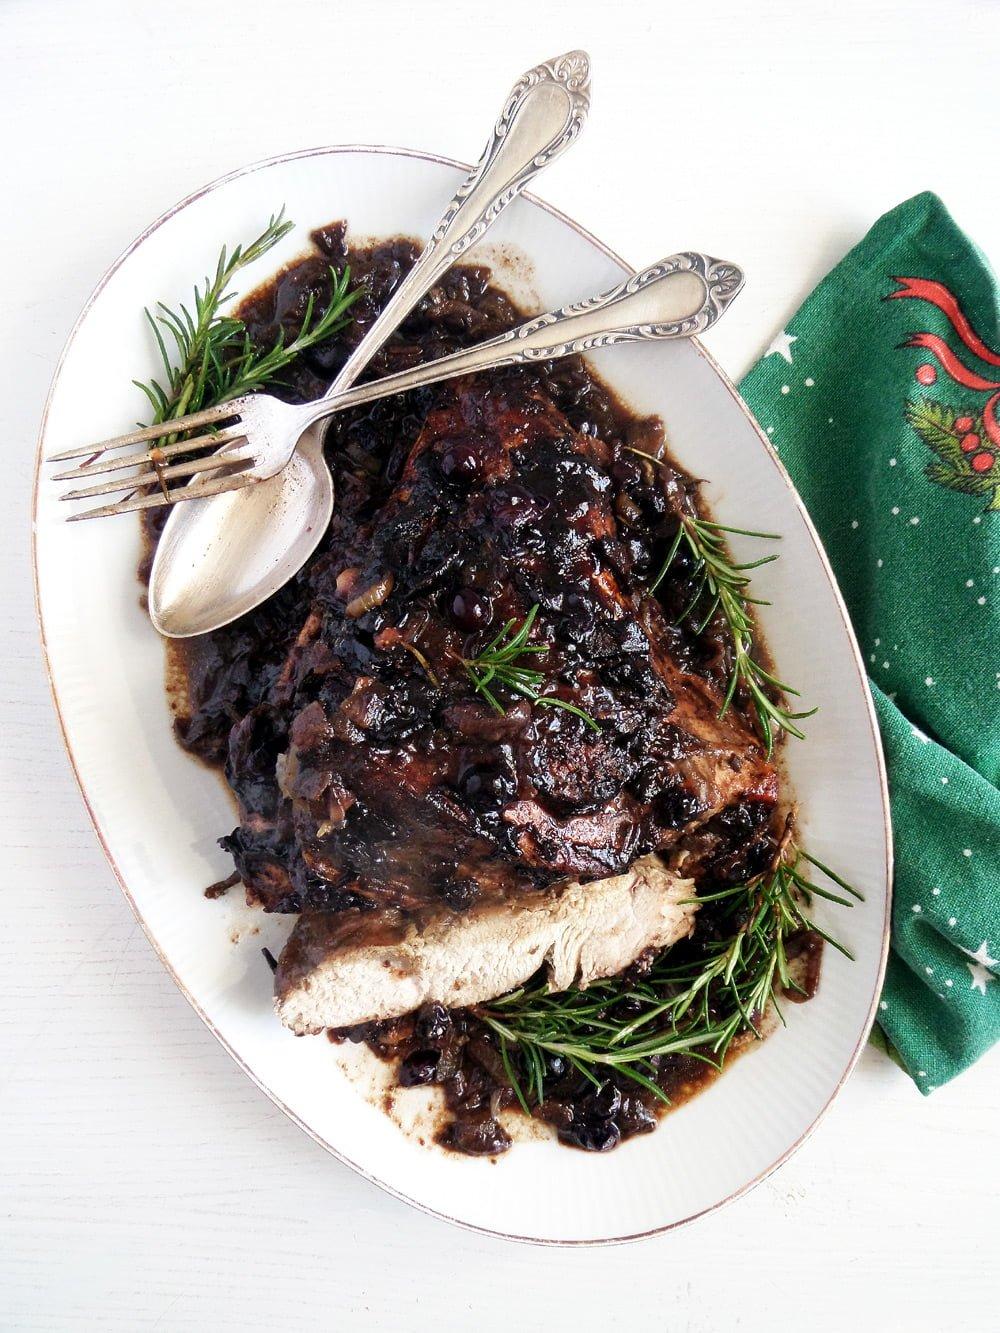 turkey blueberries sauce Tender Pork Tenderloin with a Herb Breadcrumb Crust